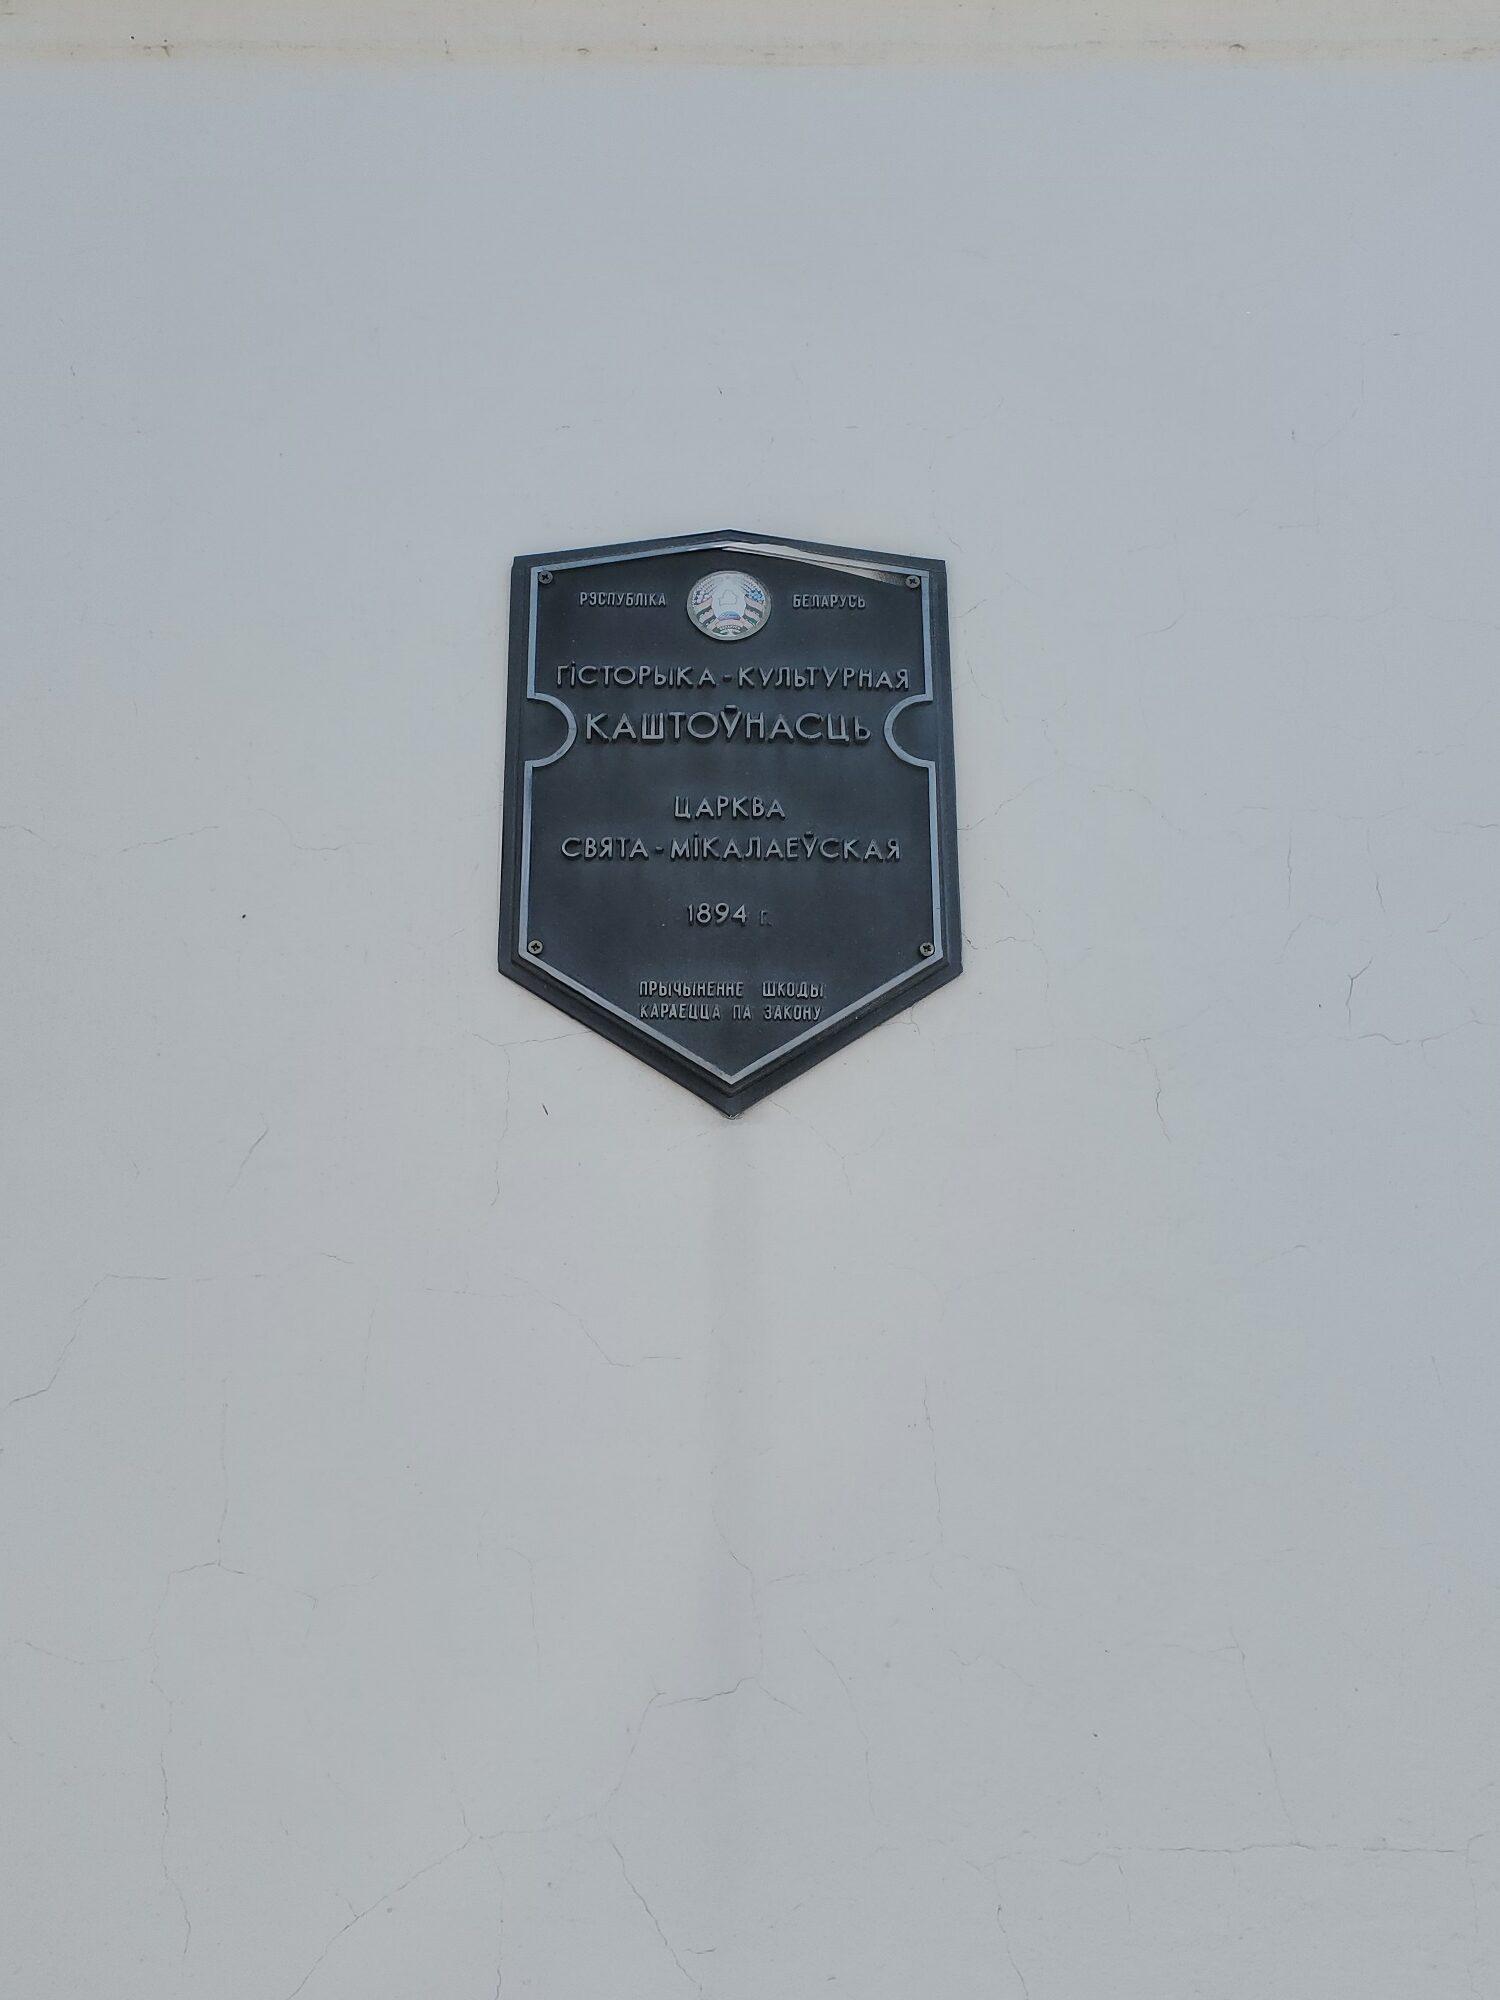 20200606 123518 rotated - Храм Николая Чудотворца в Поставах